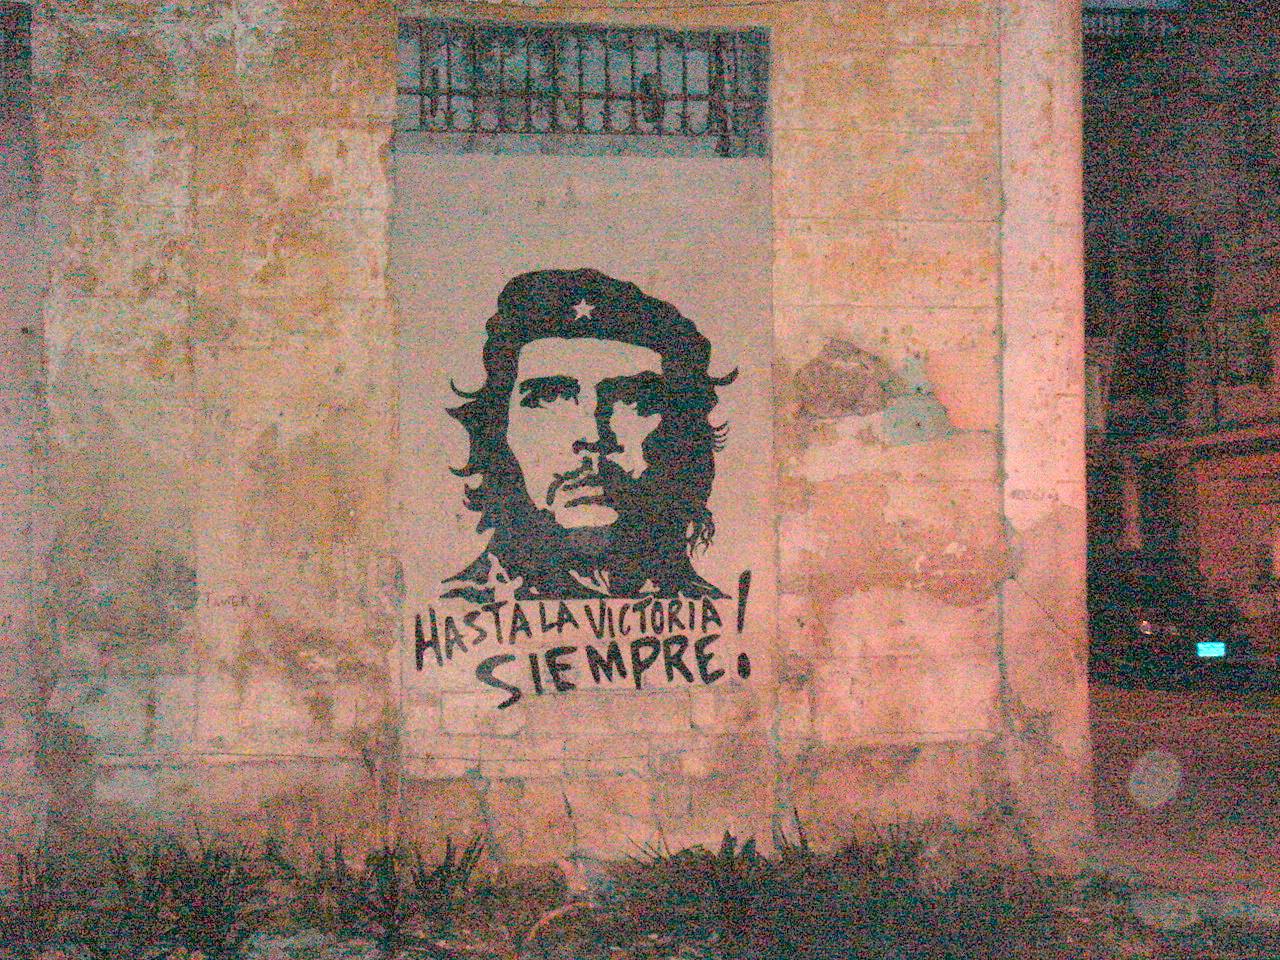 habana street art